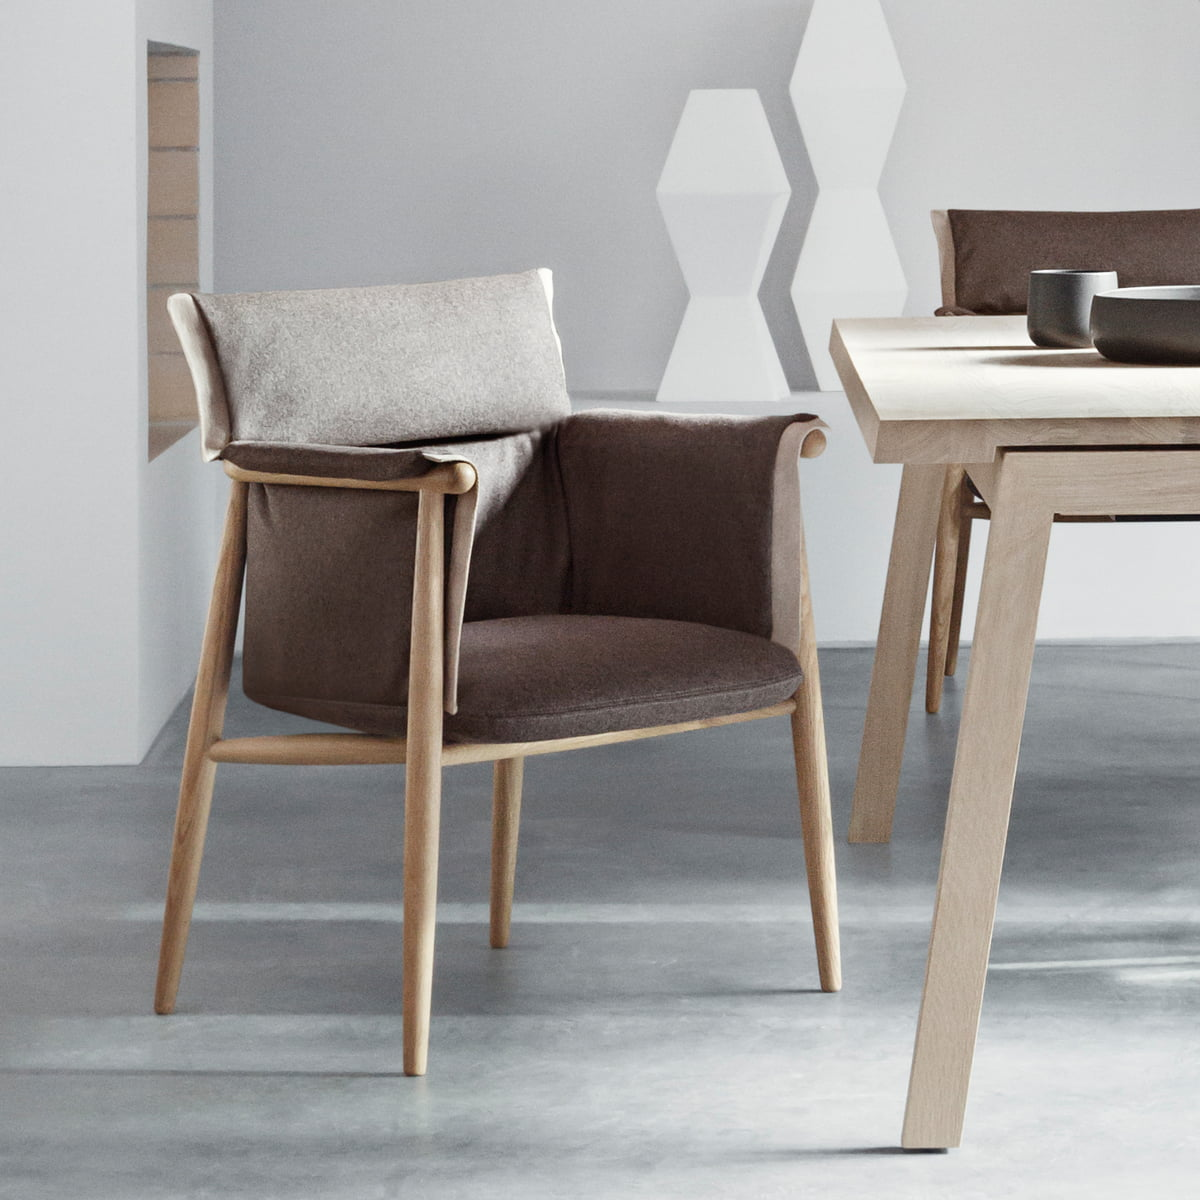 Carl Hansen Chairs embrace chaircarl hansen in the shop